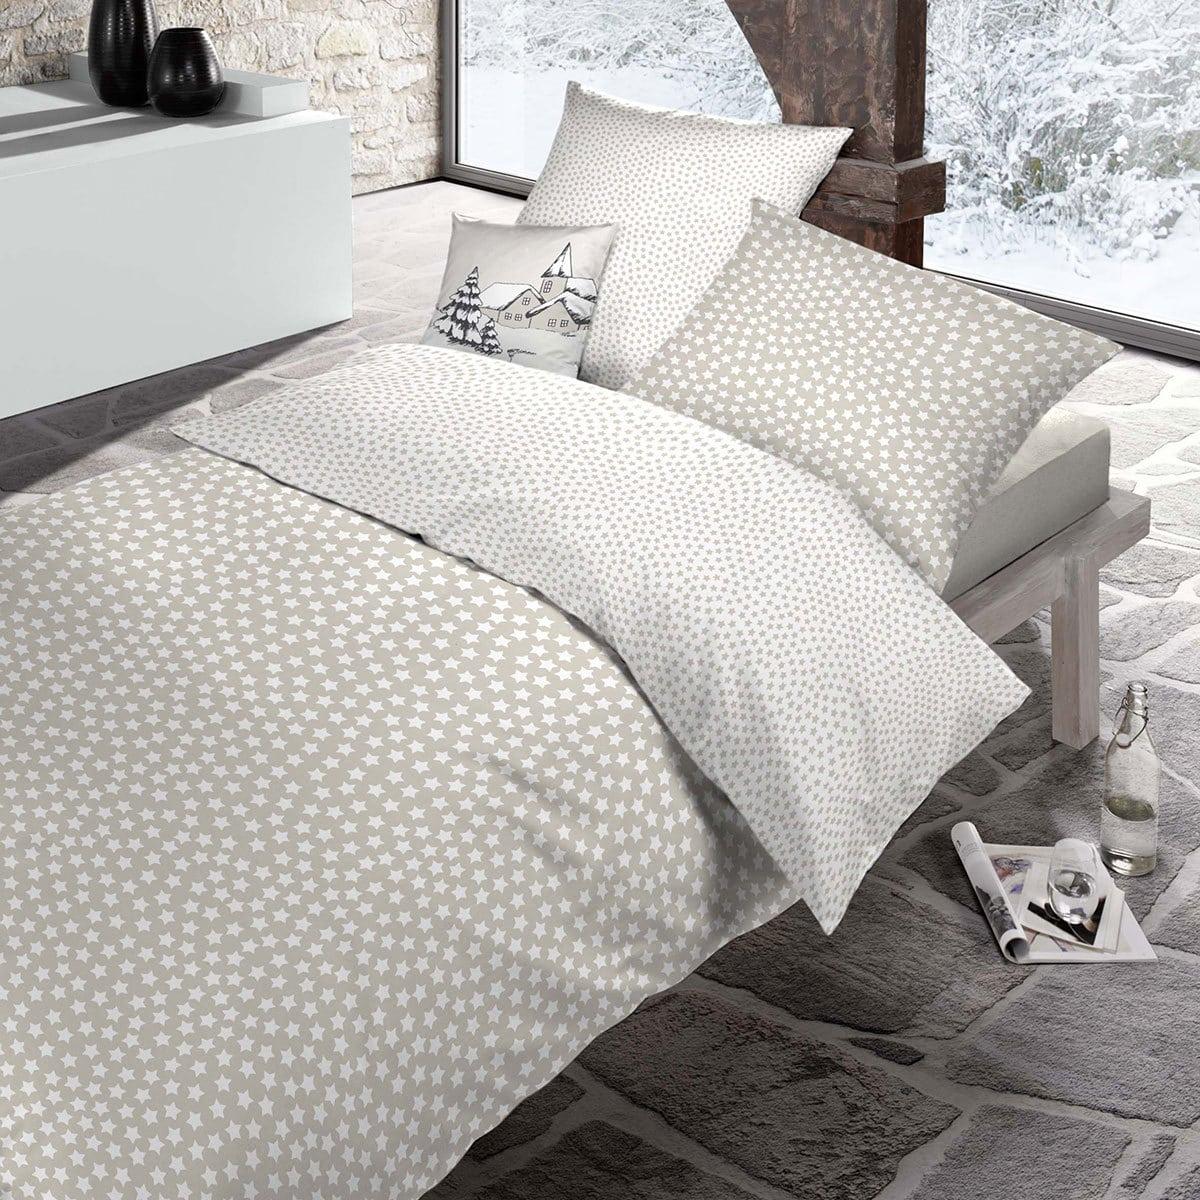 schlafgut casual cotton bettw sche stardream kandis. Black Bedroom Furniture Sets. Home Design Ideas